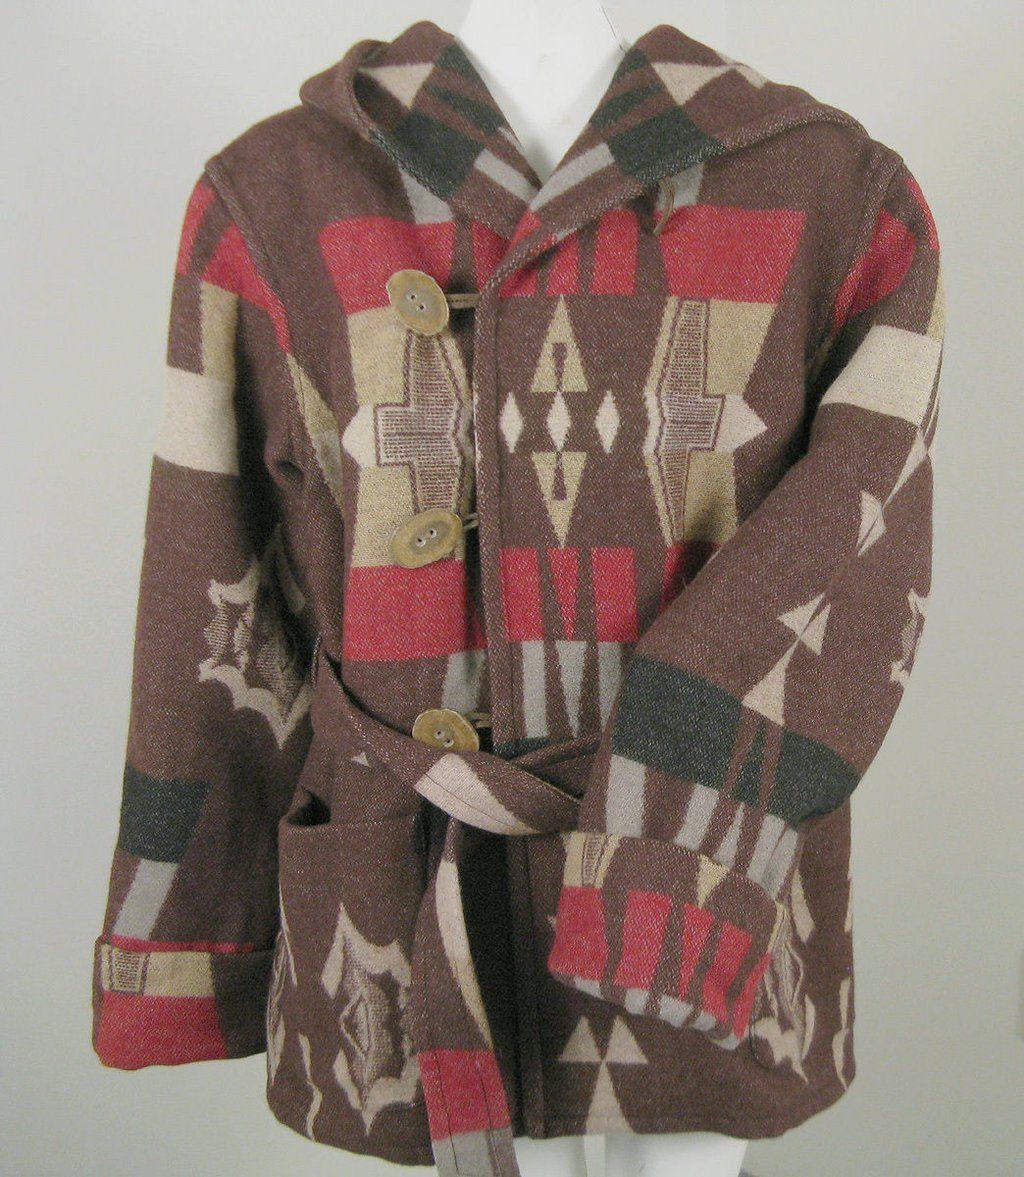 - NEW! $1800 Gorgeous Polo Ralph Lauren Womens Adirondack ... -  -https://t.co/Tyx25zt7eC - #Women https://t.co/4X8BgSCXTk